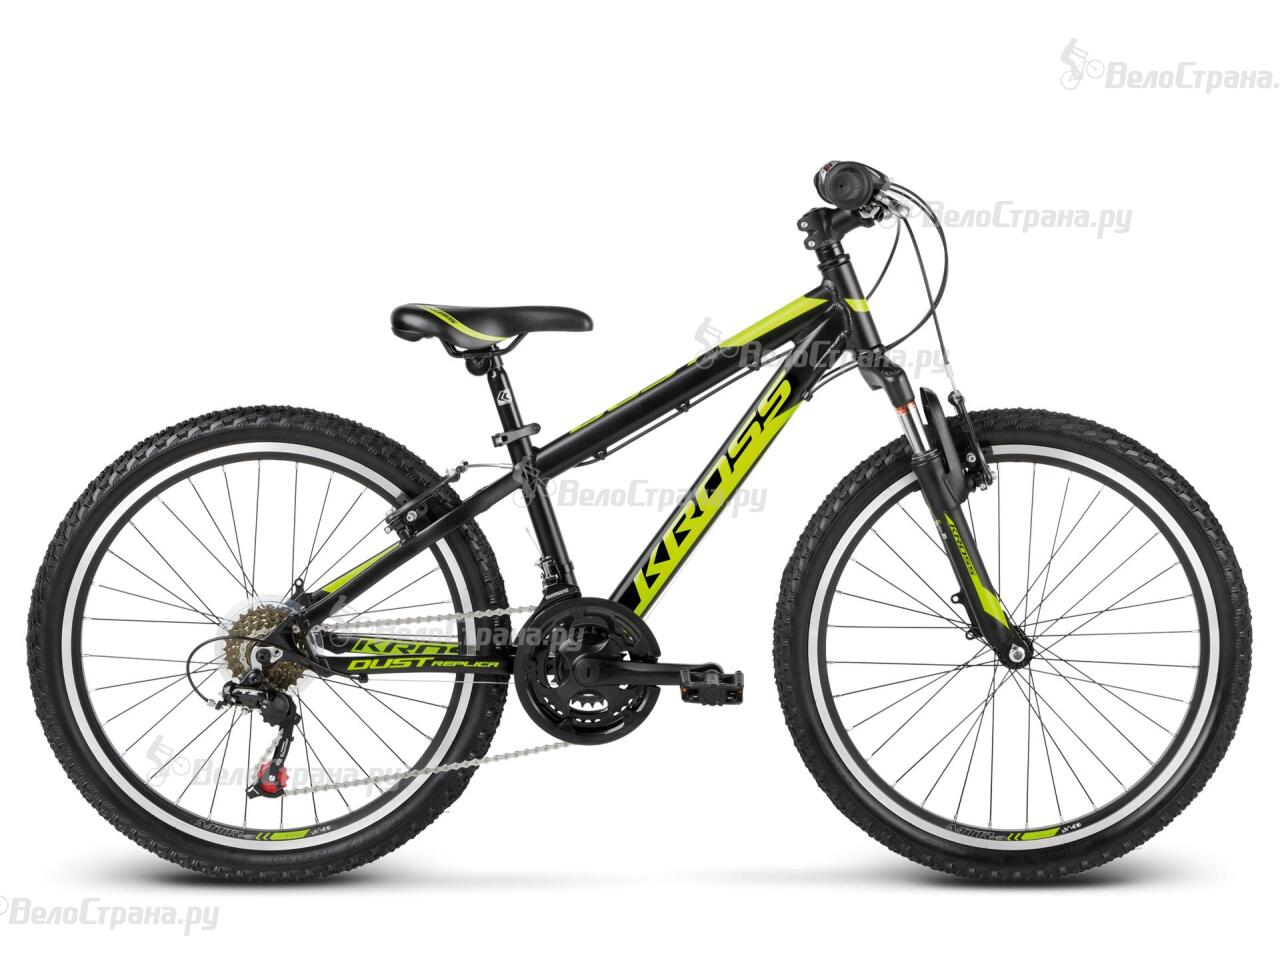 Велосипед Kross Dust Replica (2017) литой диск replica fr lx 98 8 5x20 5x150 d110 2 et54 gmf